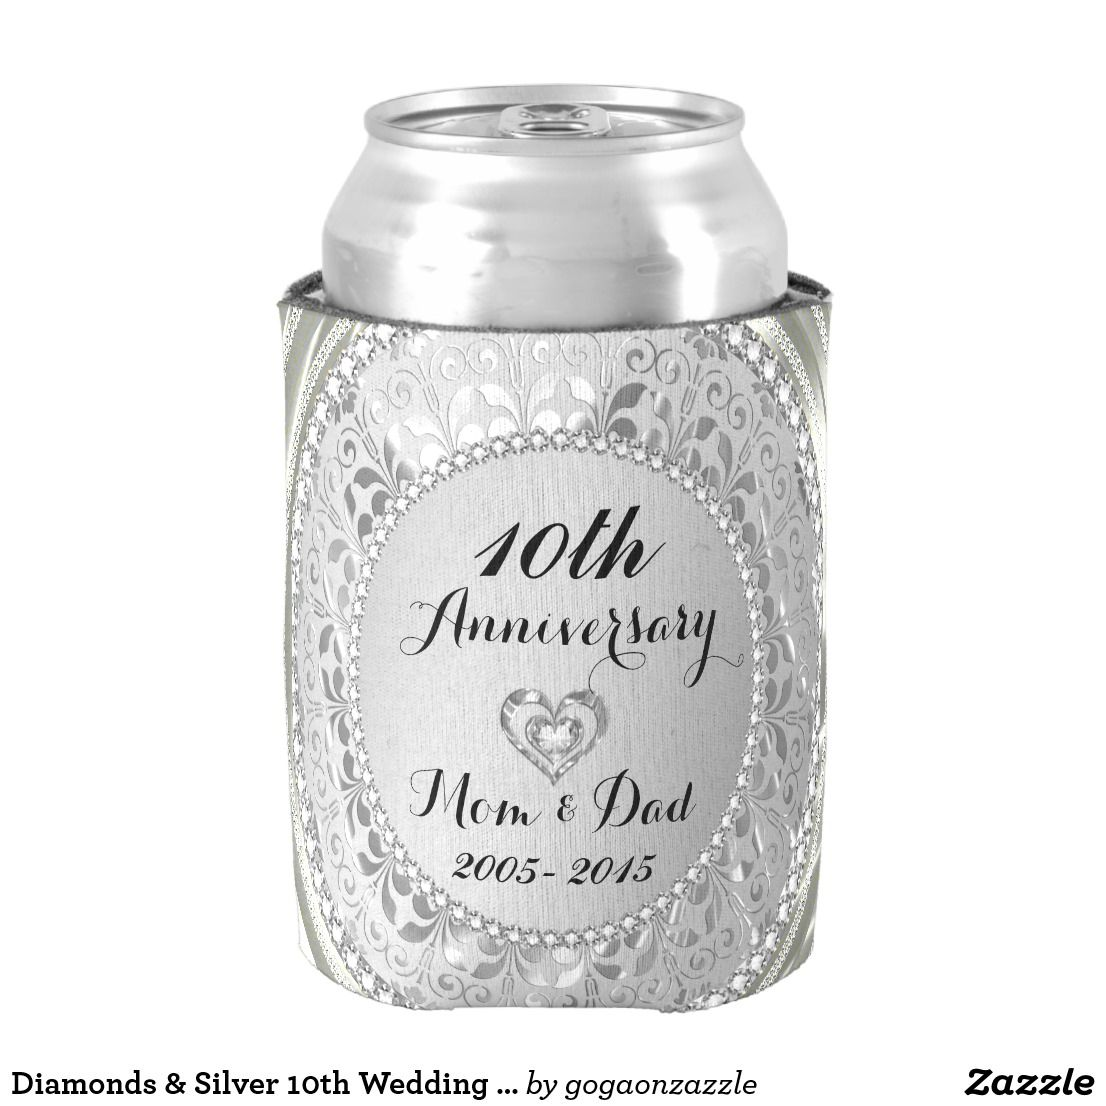 Diamonds & Silver 10th Wedding Anniversary Can Cooler